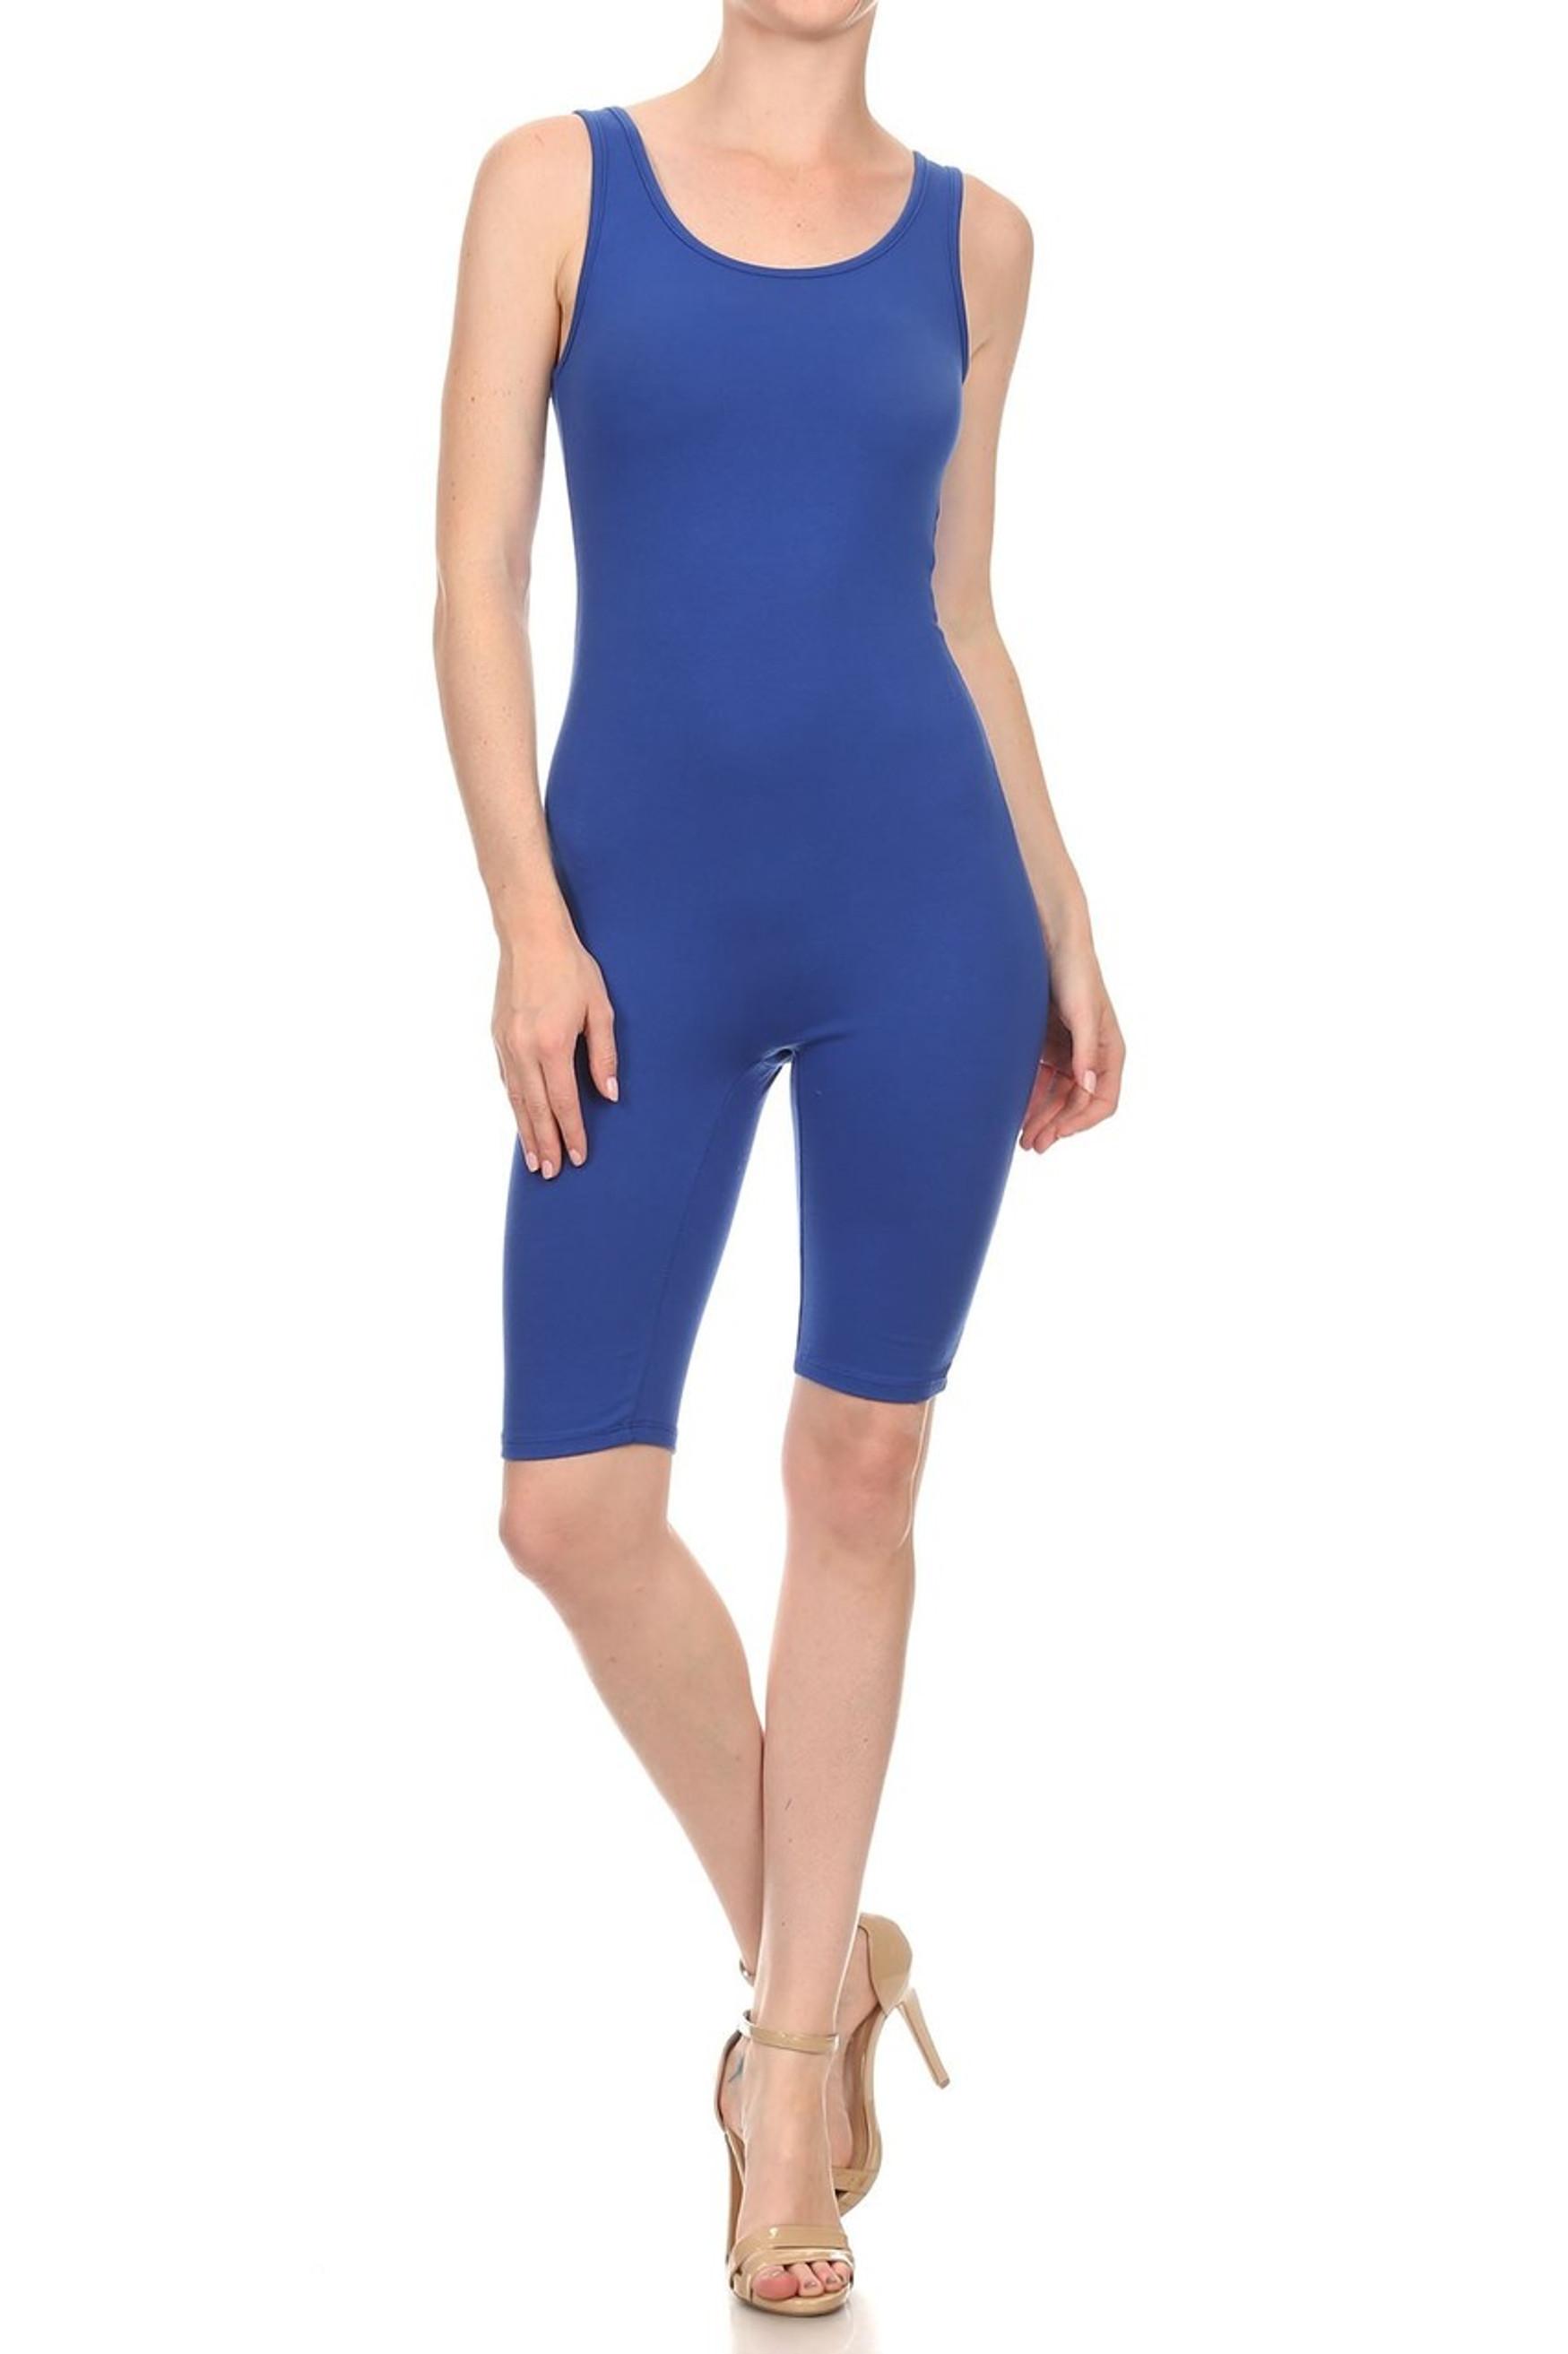 USA Basic Cotton Thigh High Plus Size Jumpsuit